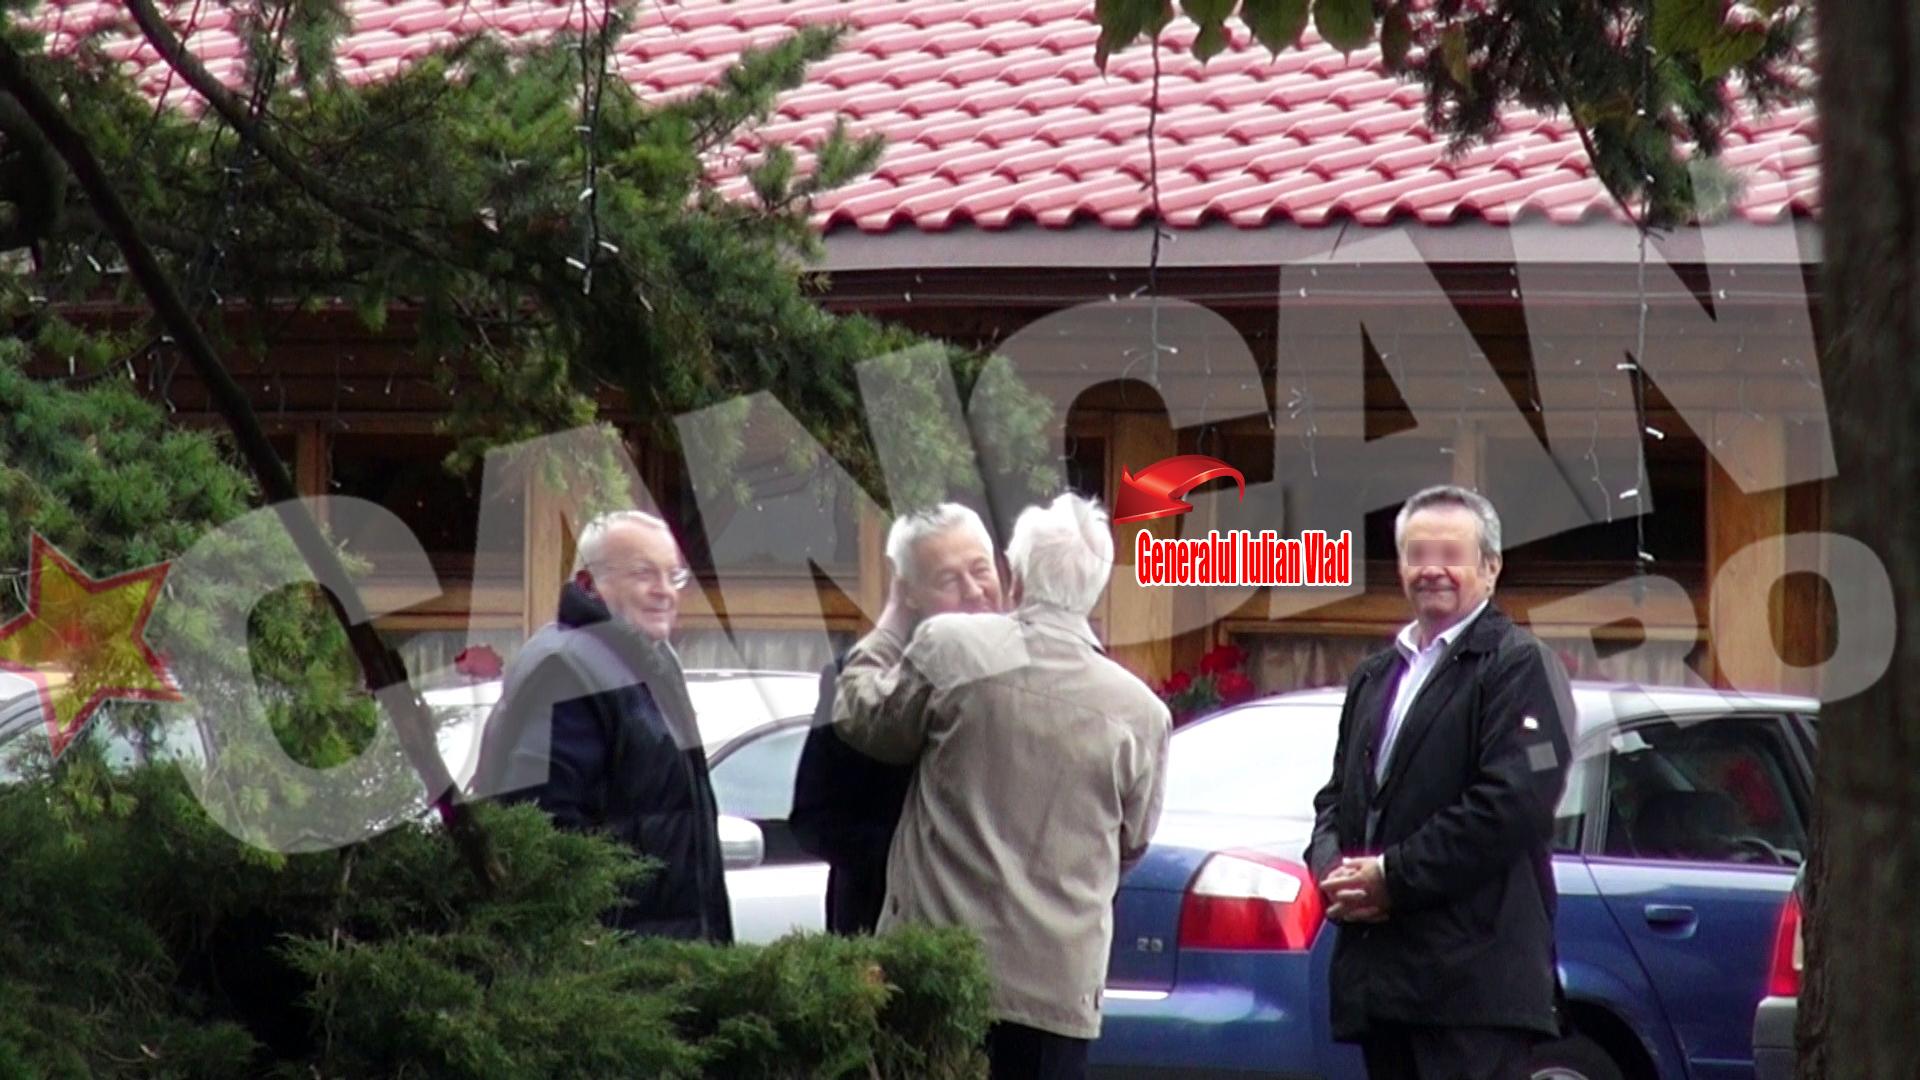 Pe Bebe Ionescu si pe generalul Iulian Vlad pare ca ii leaga o prietenie stransa